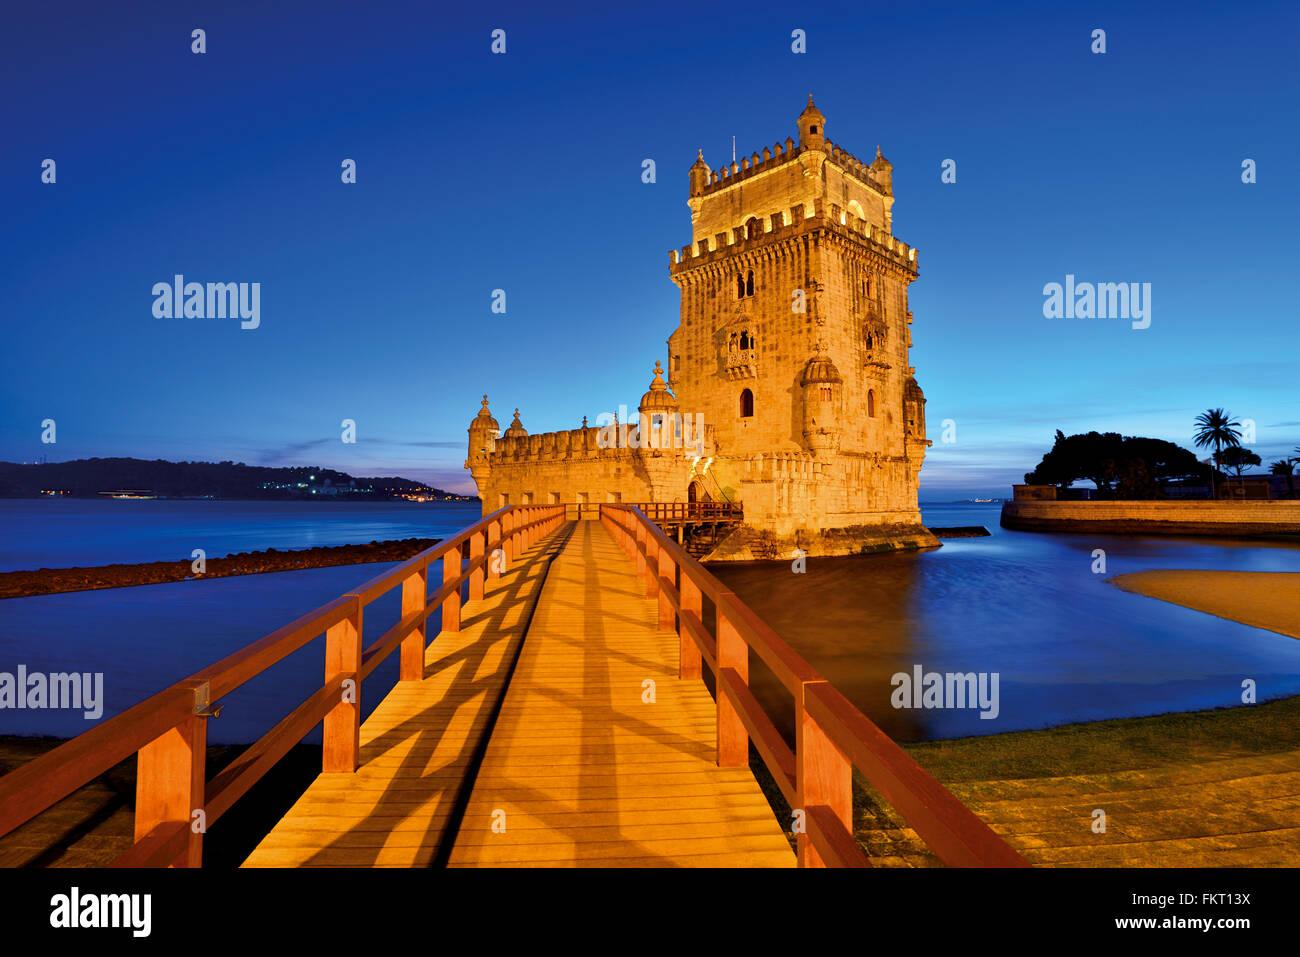 Portugal, Lisboa: Torre Monumental de Belém por noche Imagen De Stock